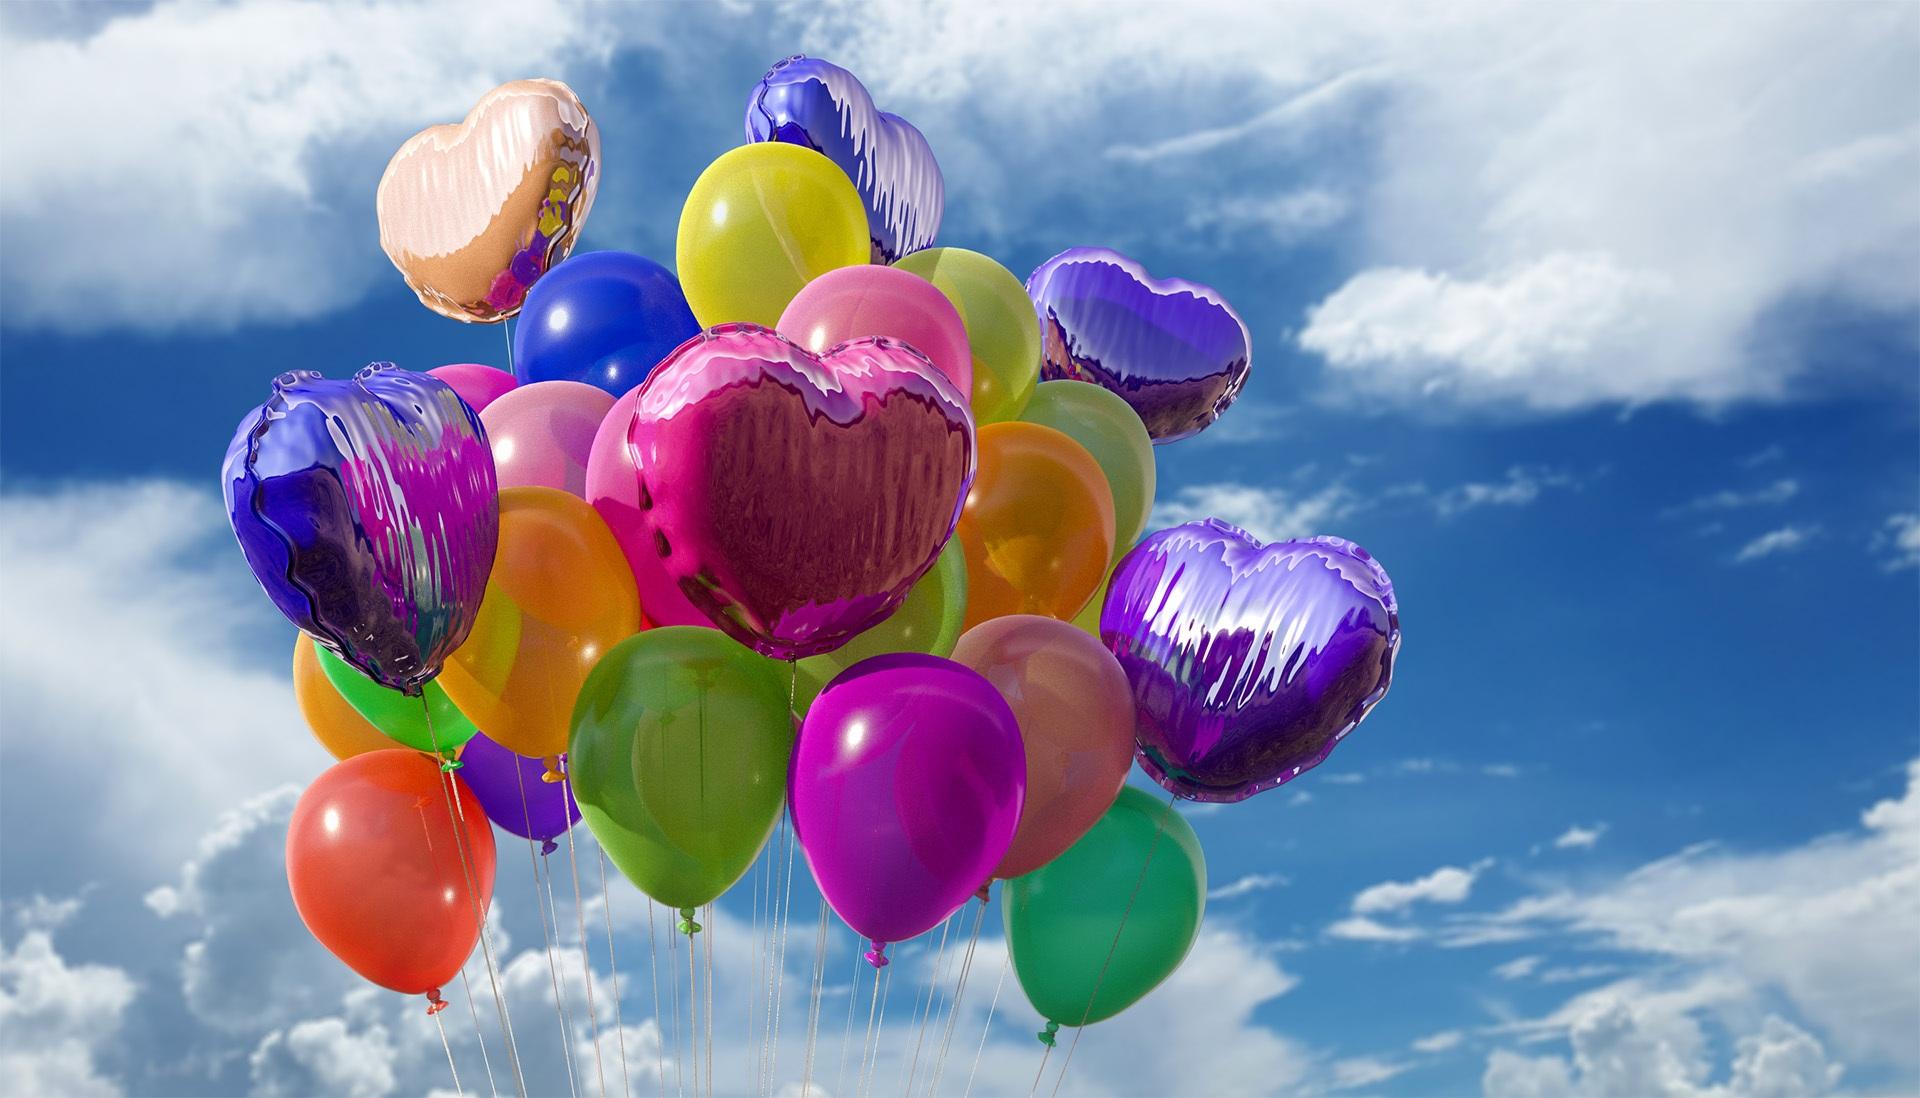 Ballonnen Met Licht : Gratis afbeeldingen licht wolk hemel lucht plastic bloem